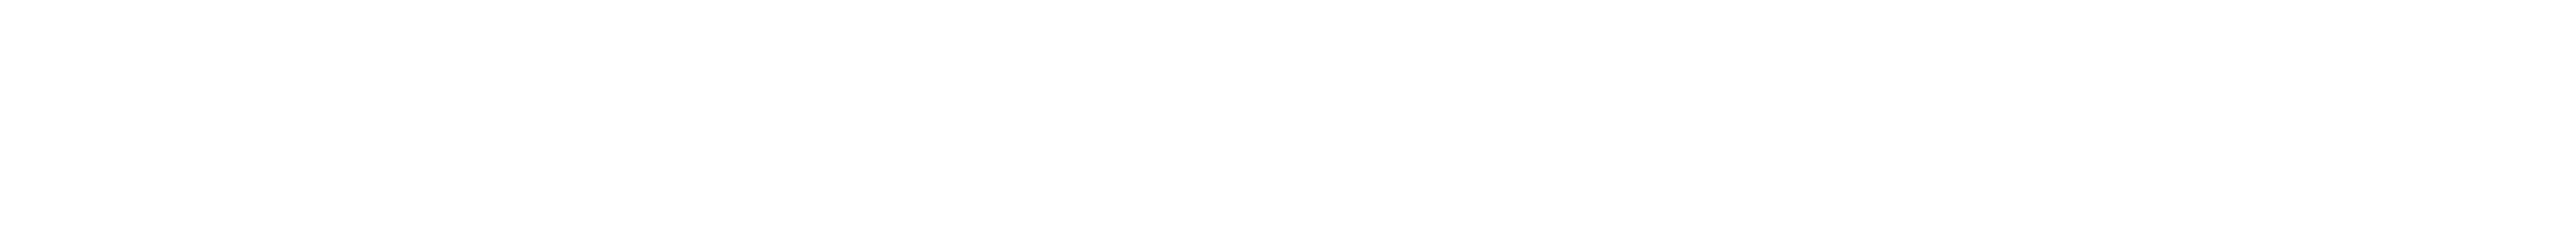 The Operator Theory